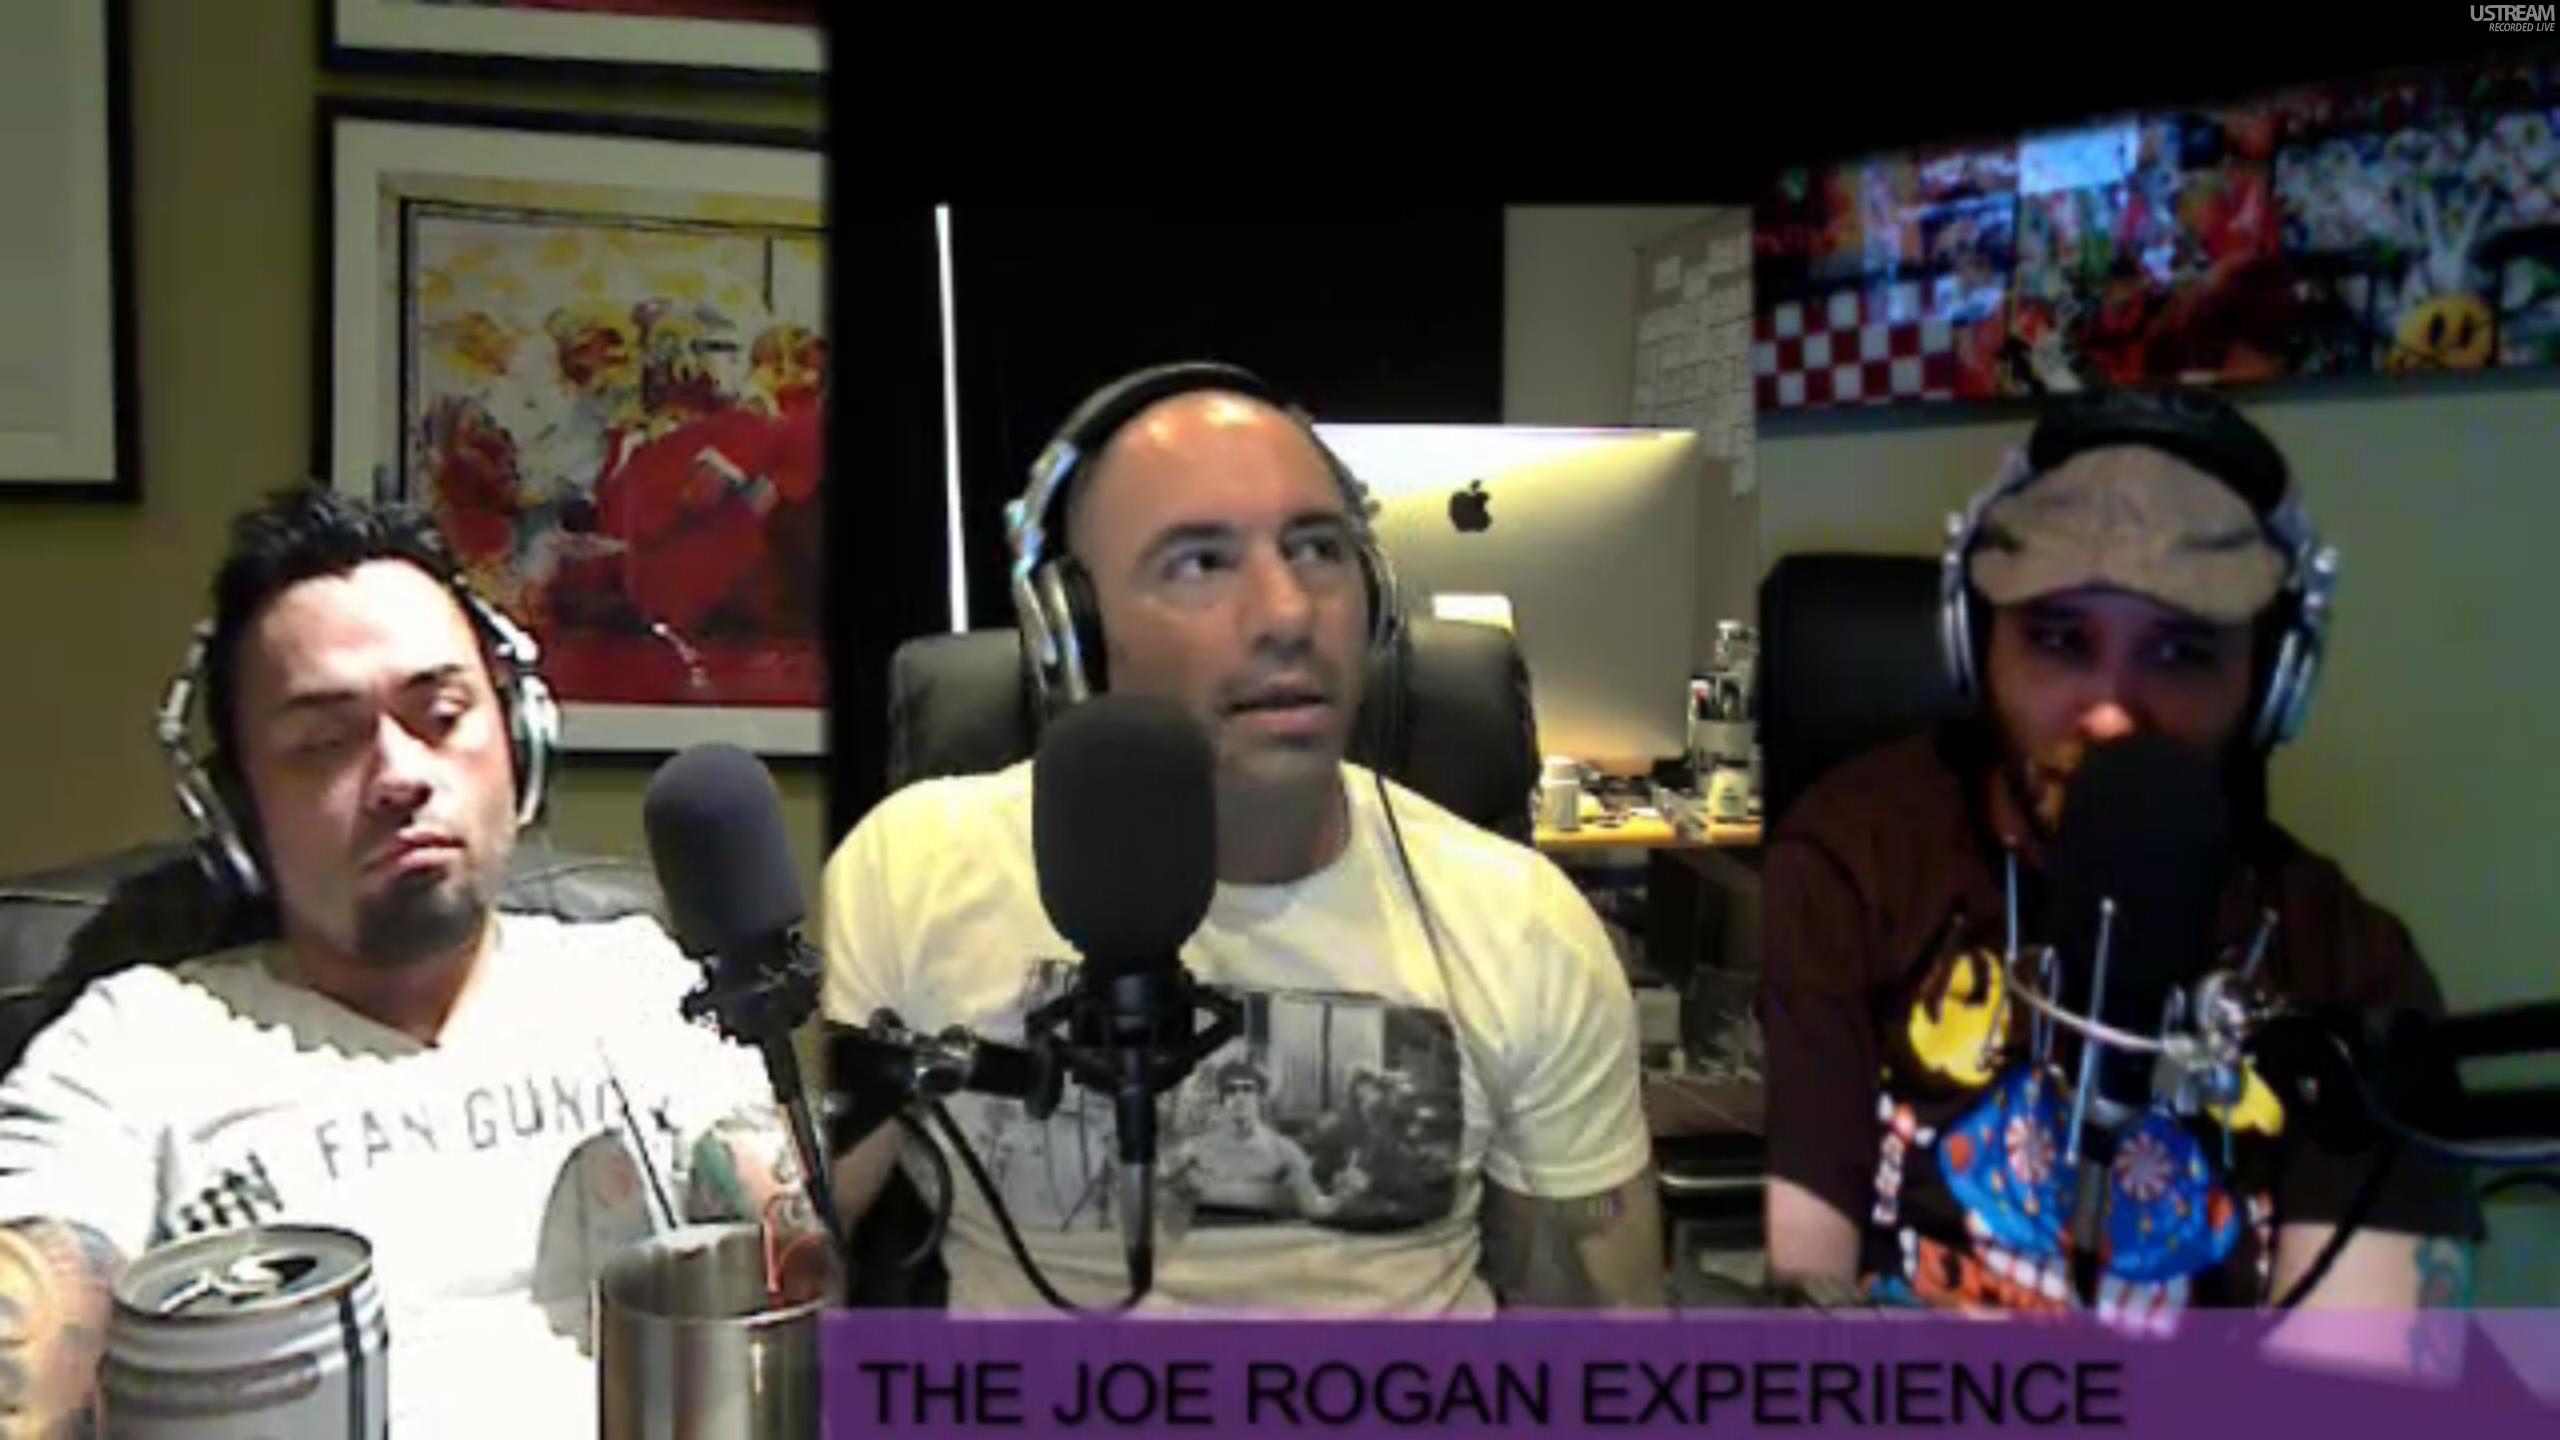 The Joe Rogan Experience JRE #206 - Eddie Bravo, Brian Redban